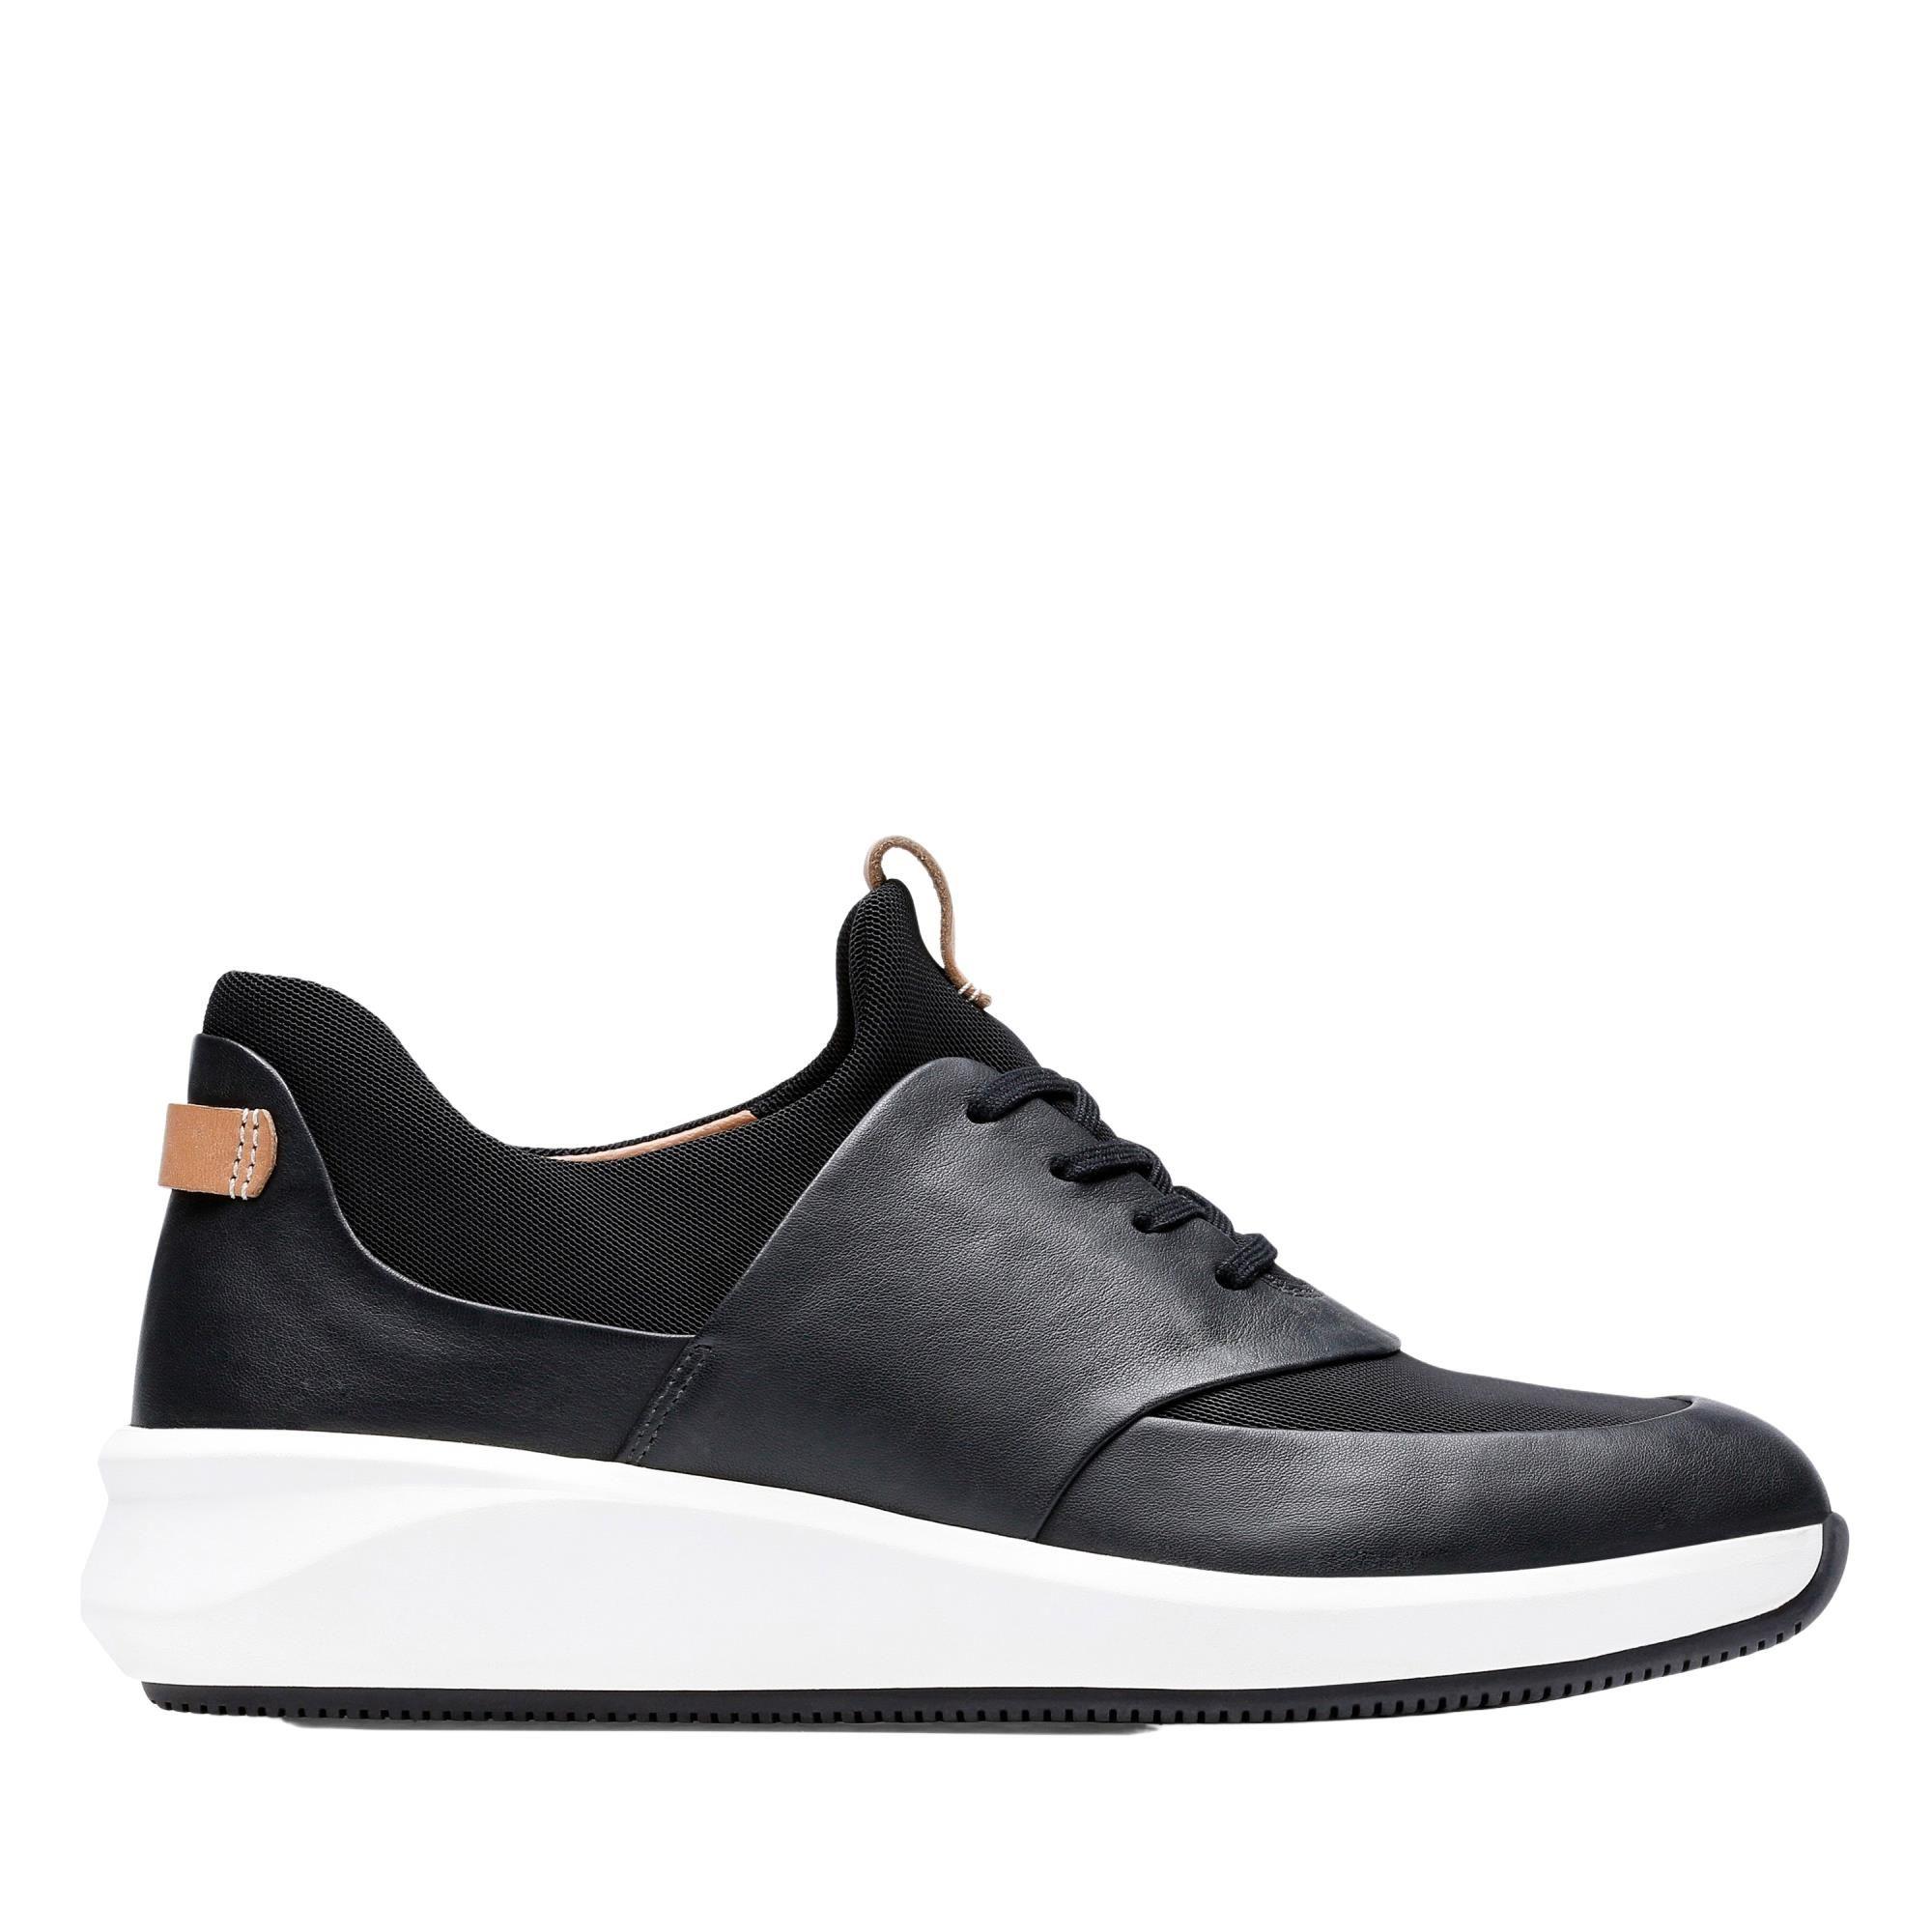 Clarks Un Rio Lace 26140395 Black Leather